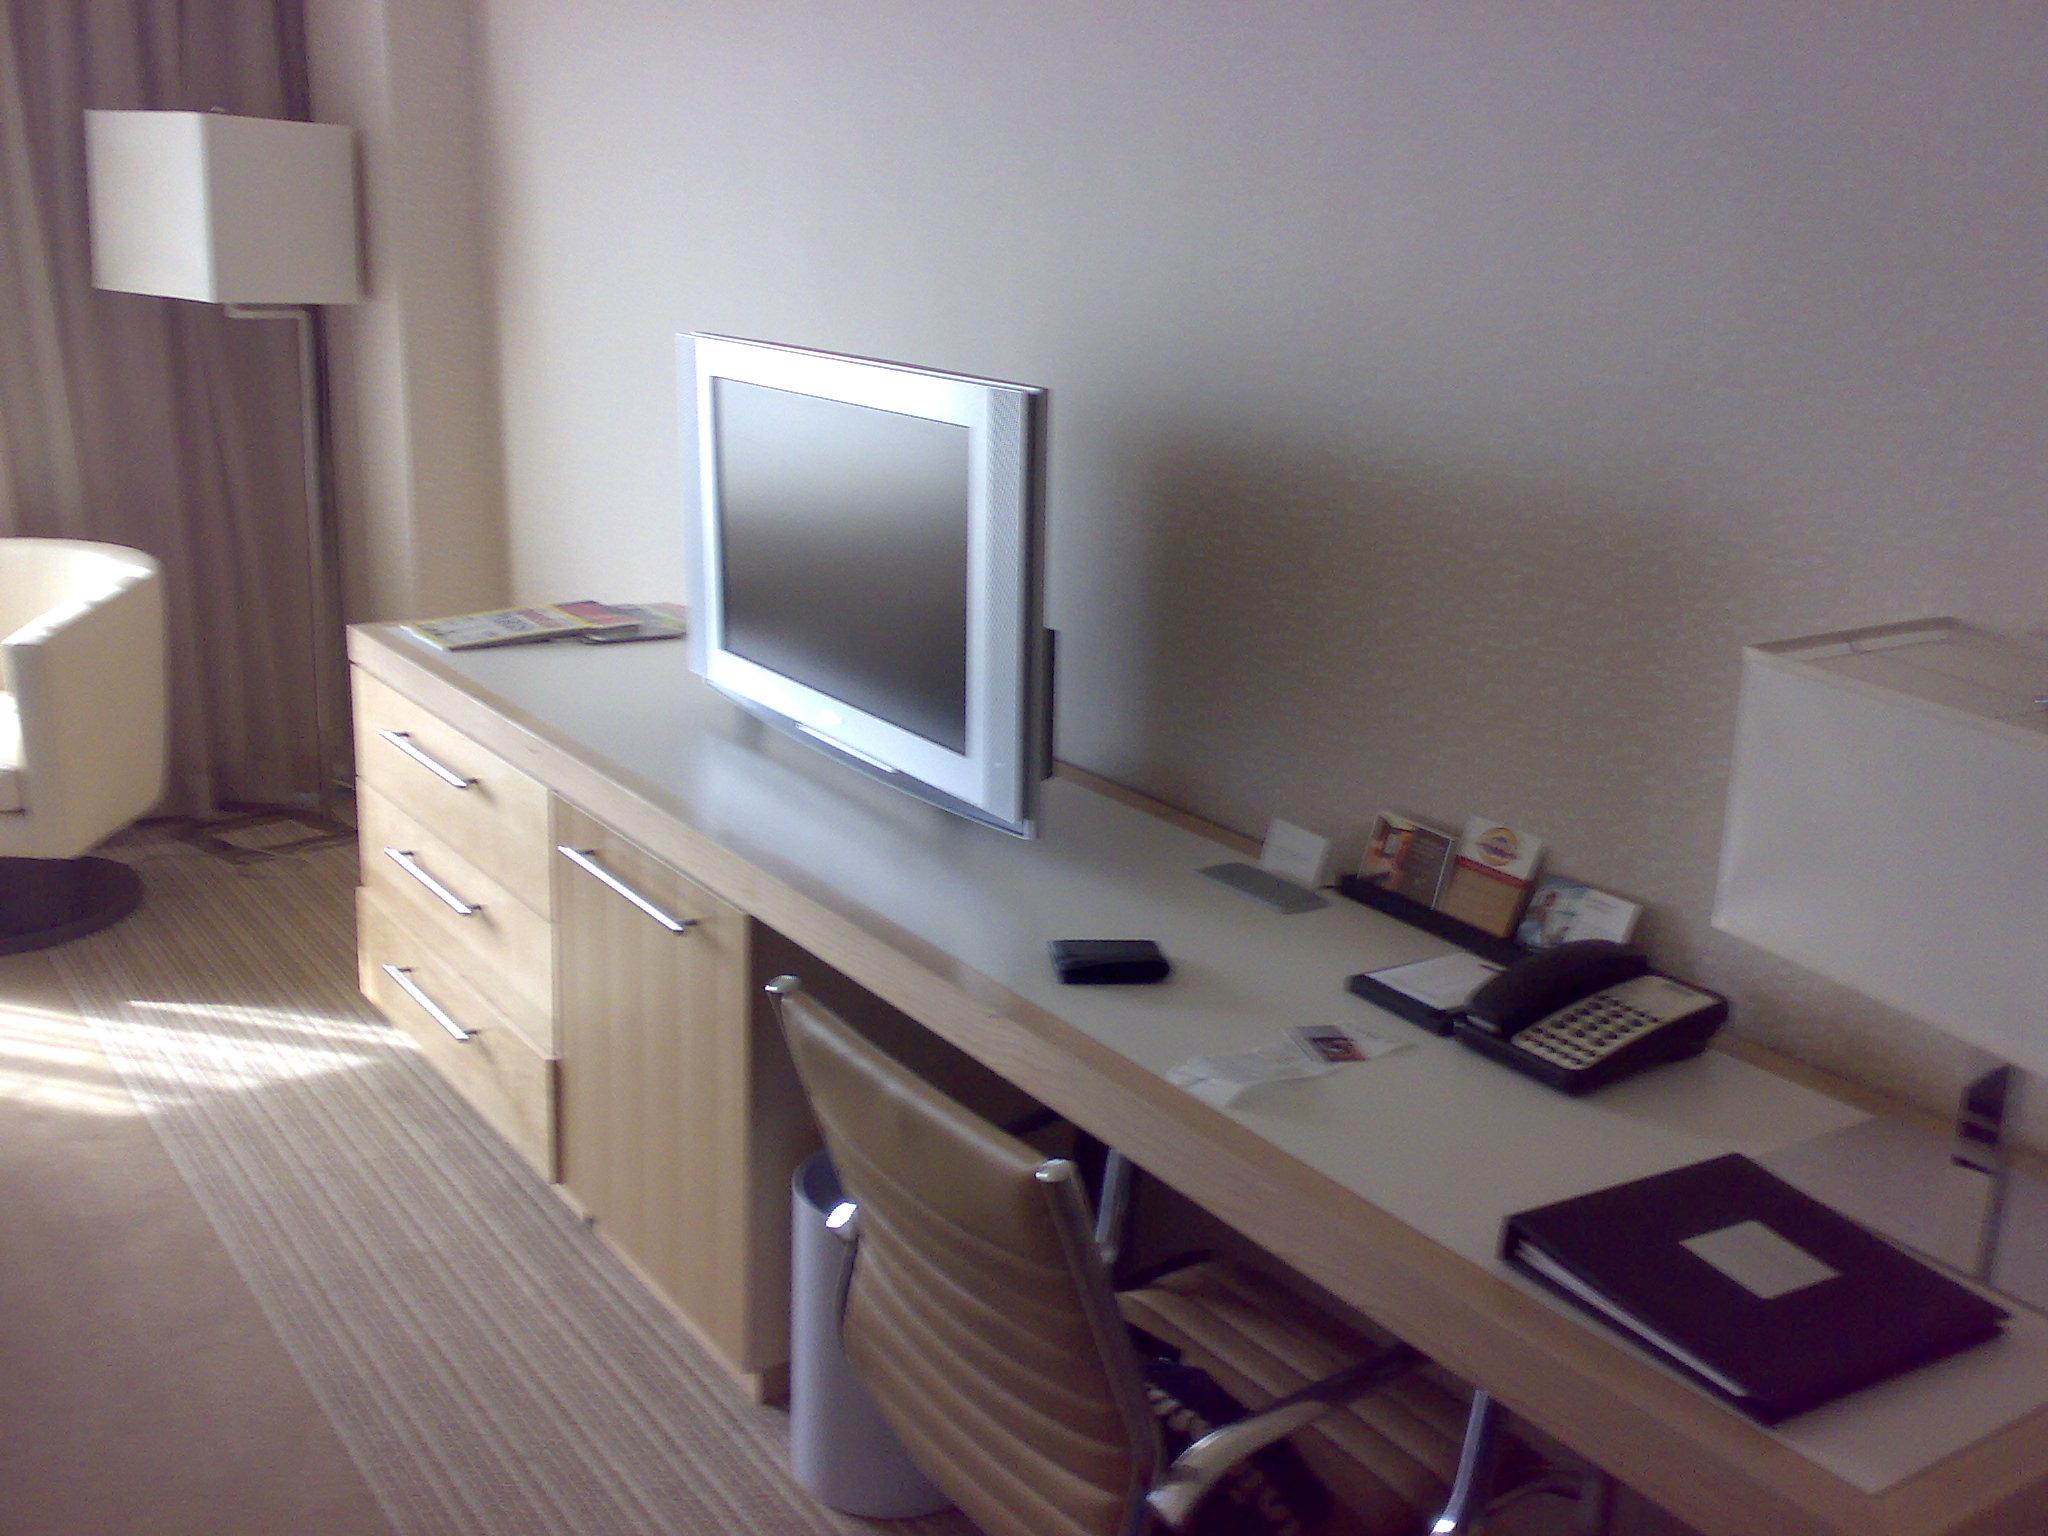 Hyatt Room #1